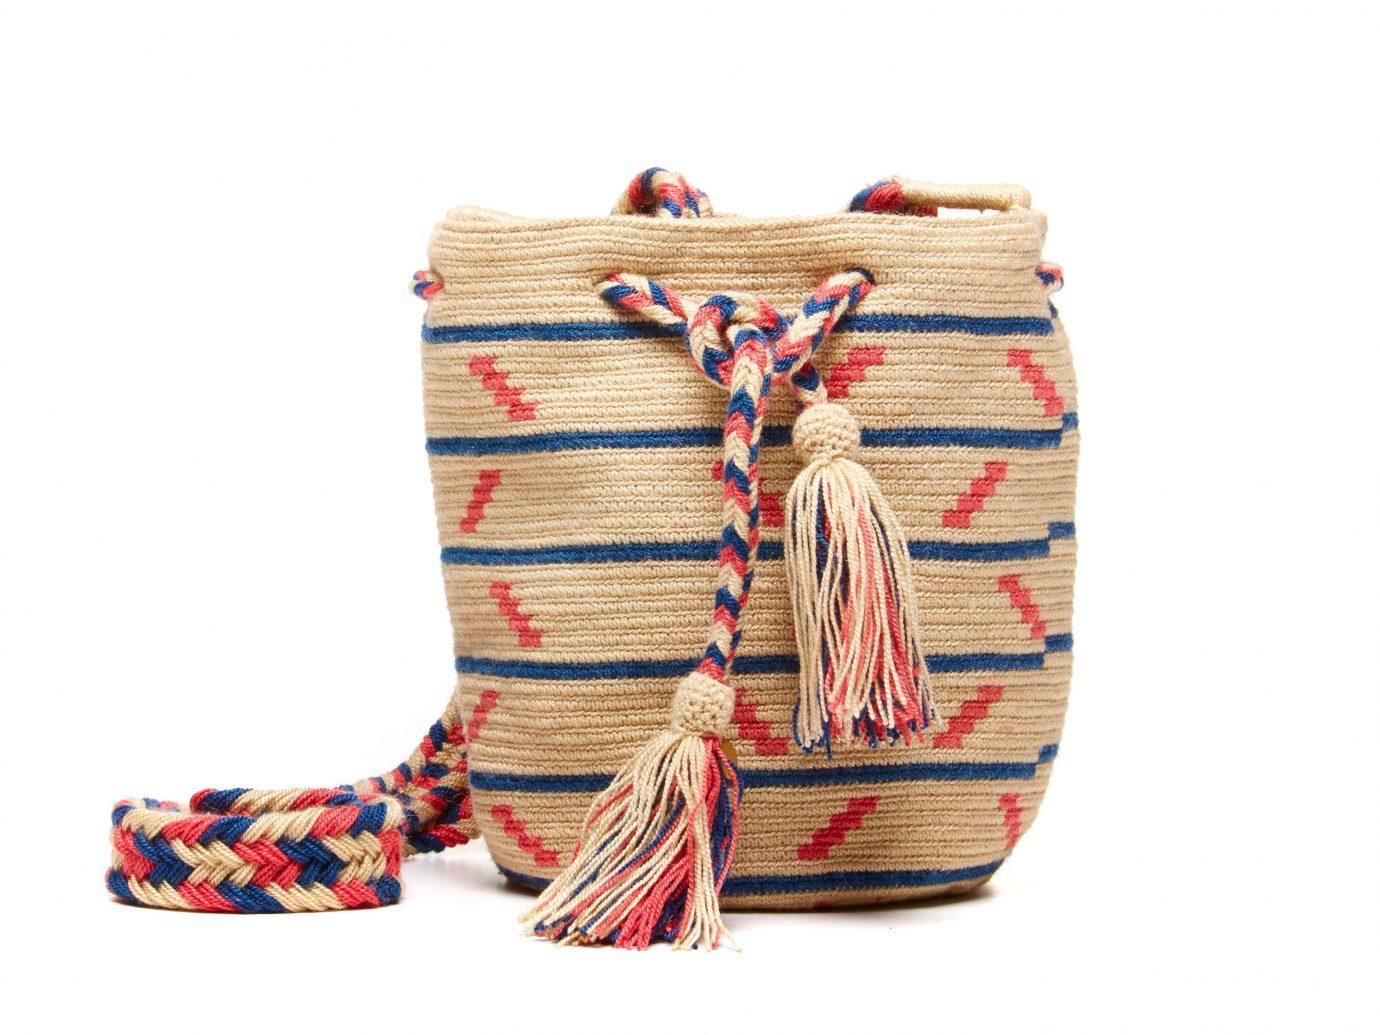 Style + Design bag fashion accessory pattern textile handbag decorated colorful colored thread